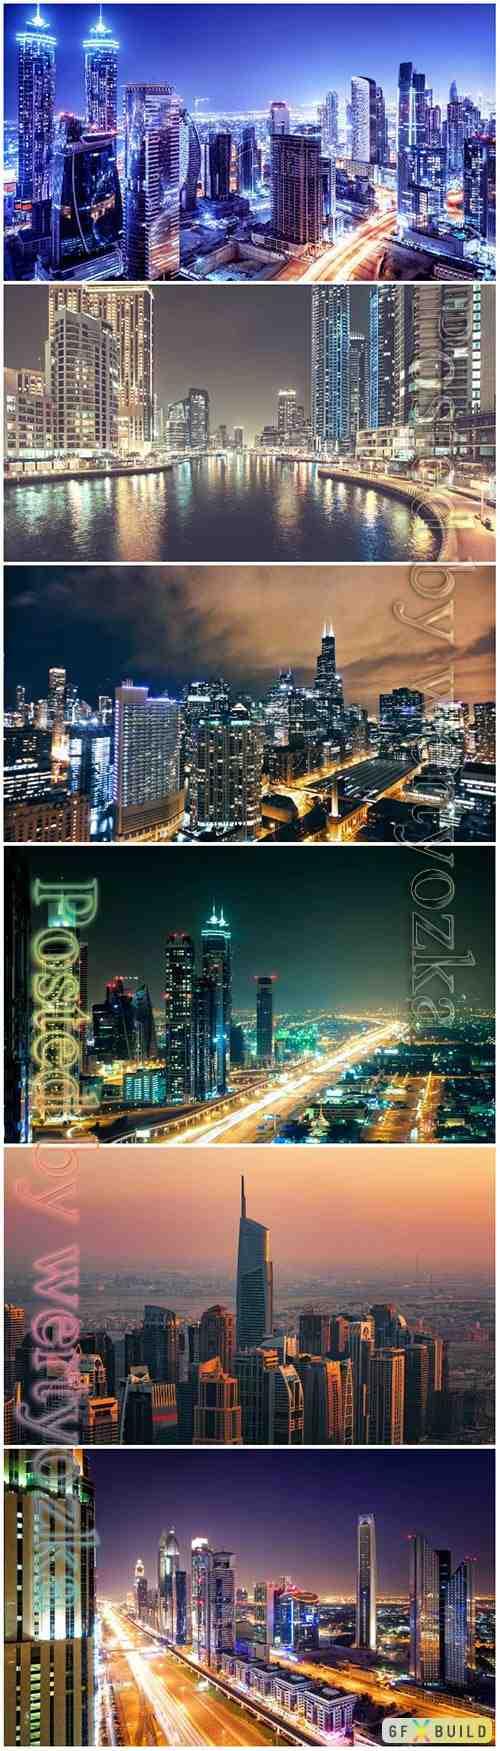 Night cities beautiful stock photo